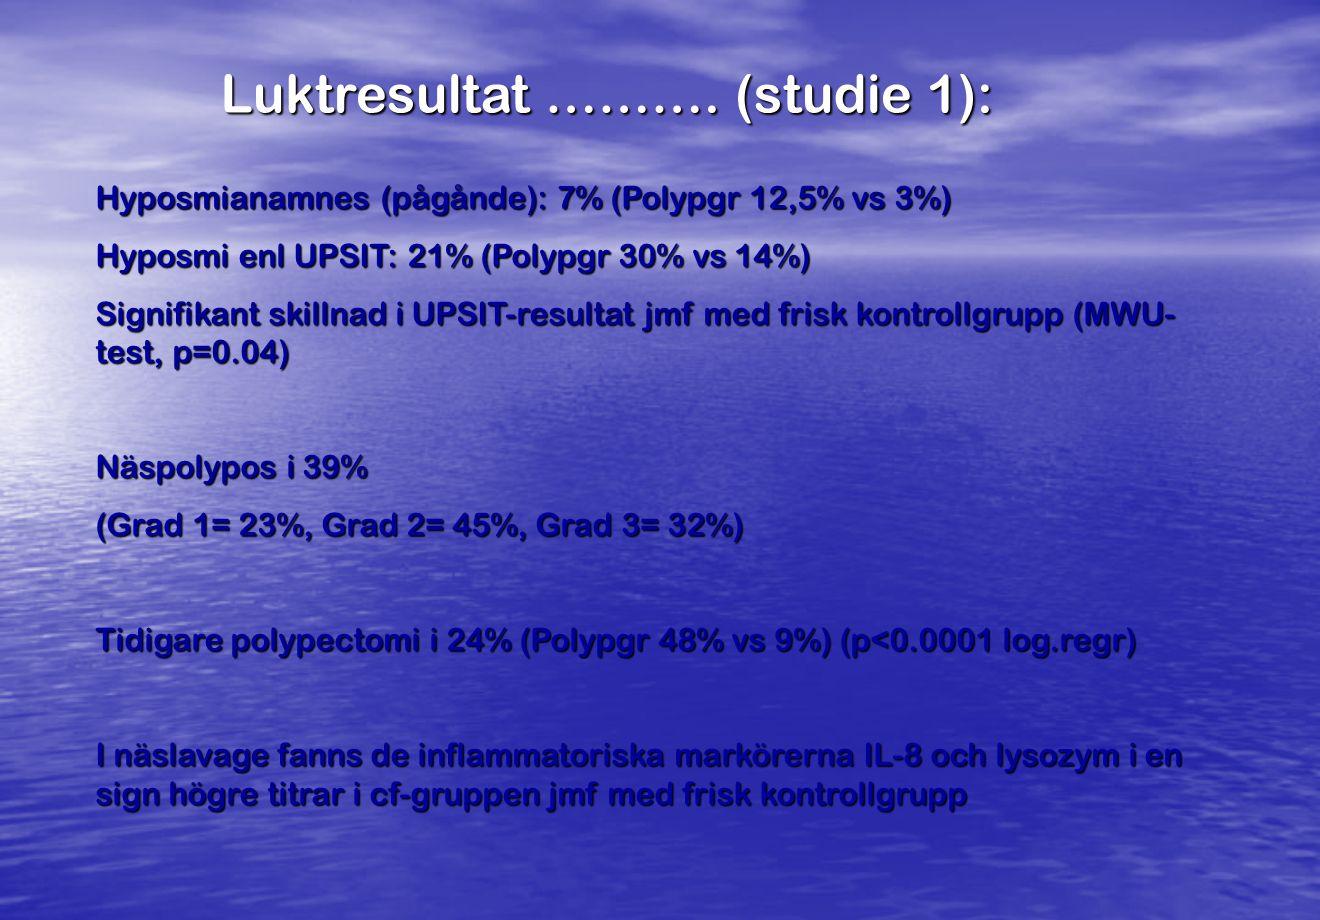 Luktresultat ………. (studie 1): Hyposmianamnes (pågånde): 7% (Polypgr 12,5% vs 3%) Hyposmi enl UPSIT: 21% (Polypgr 30% vs 14%) Signifikant skillnad i UP